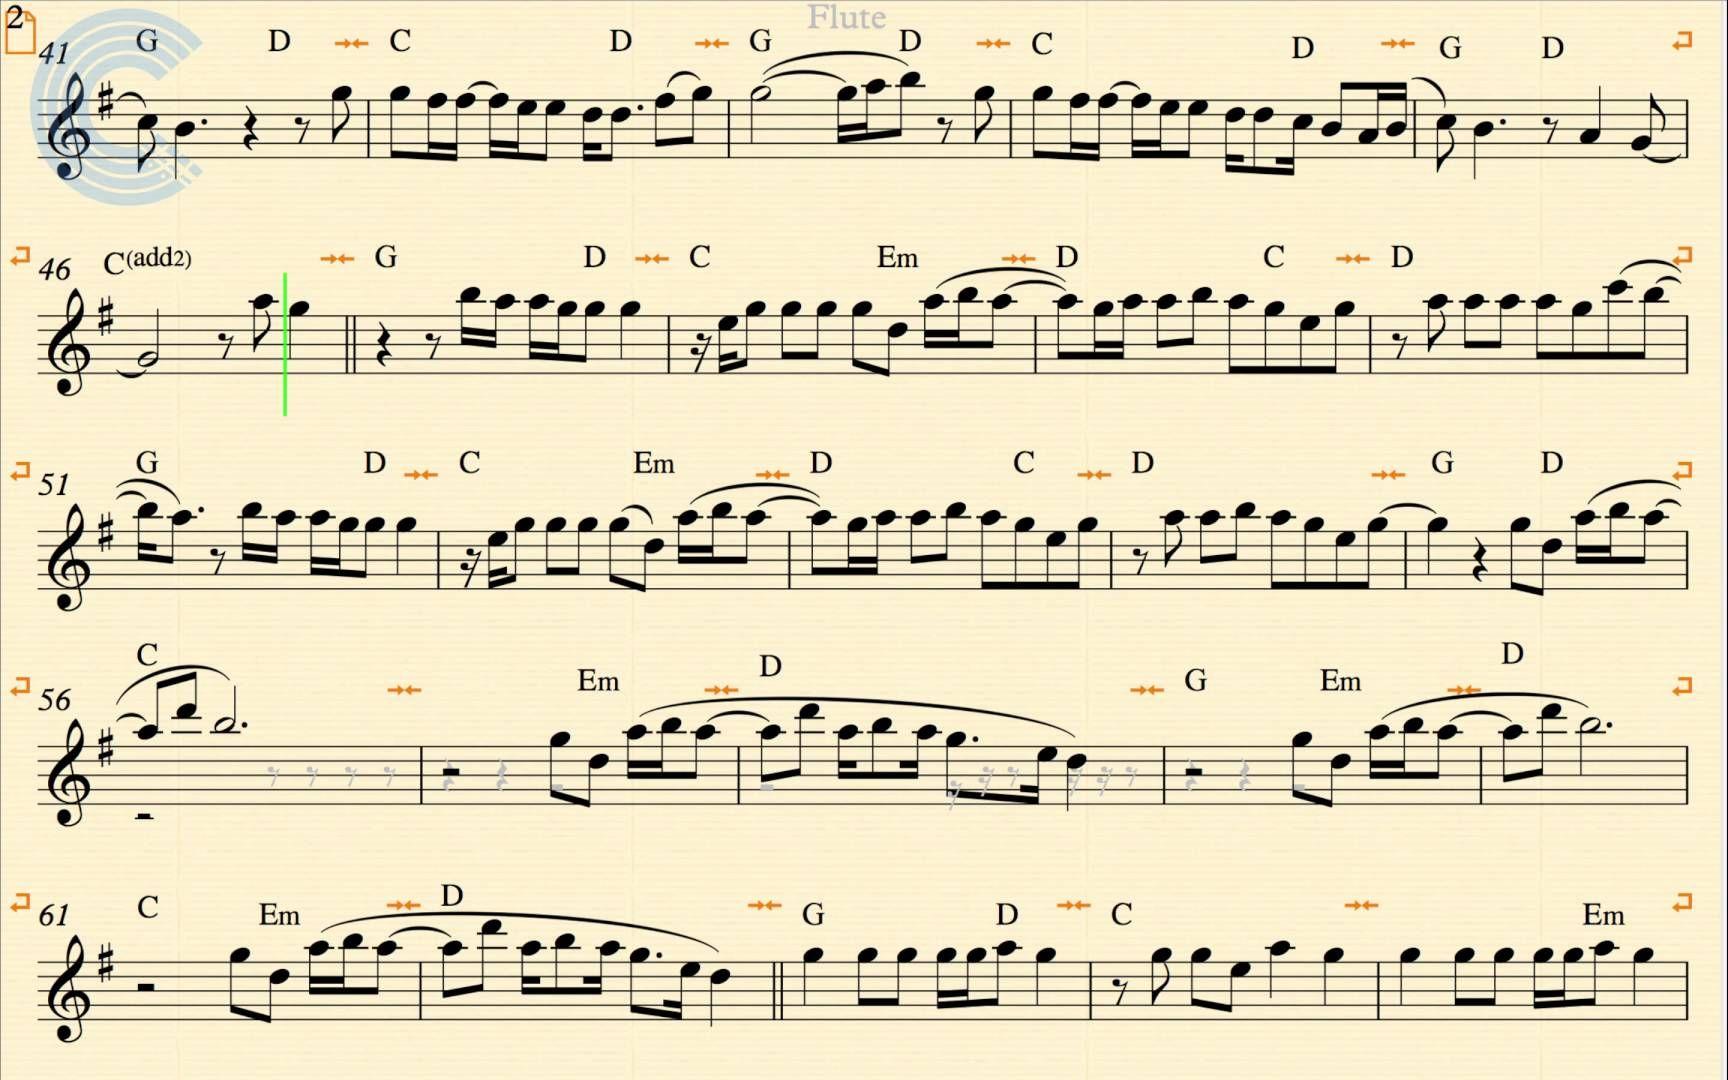 Flute 22 Taylor Swift Sheet Music Chords Vocals Flute